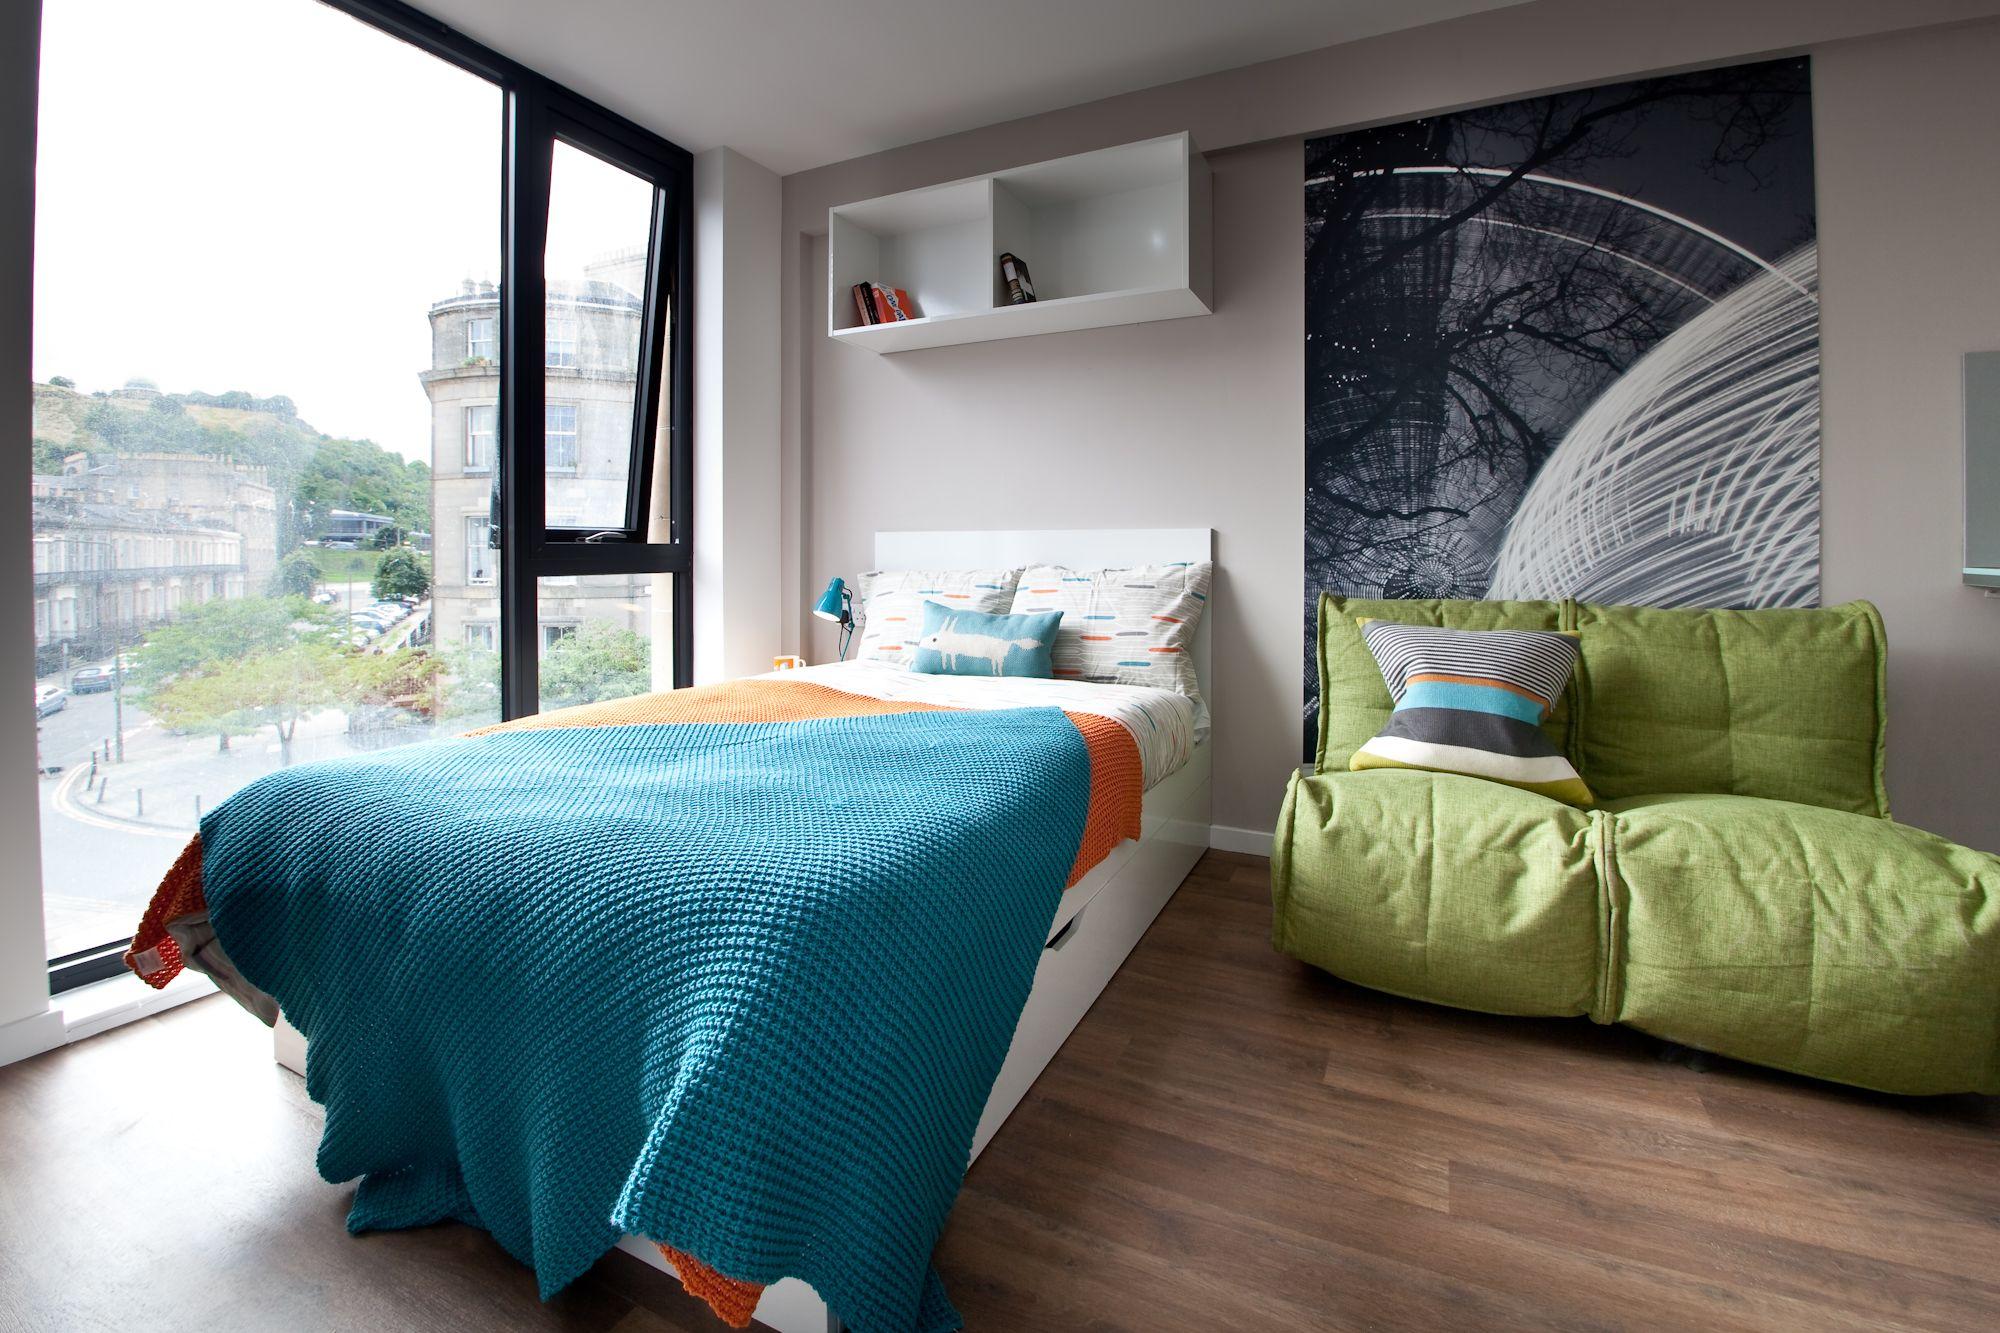 student accommodation edinburgh gatewayapartments student